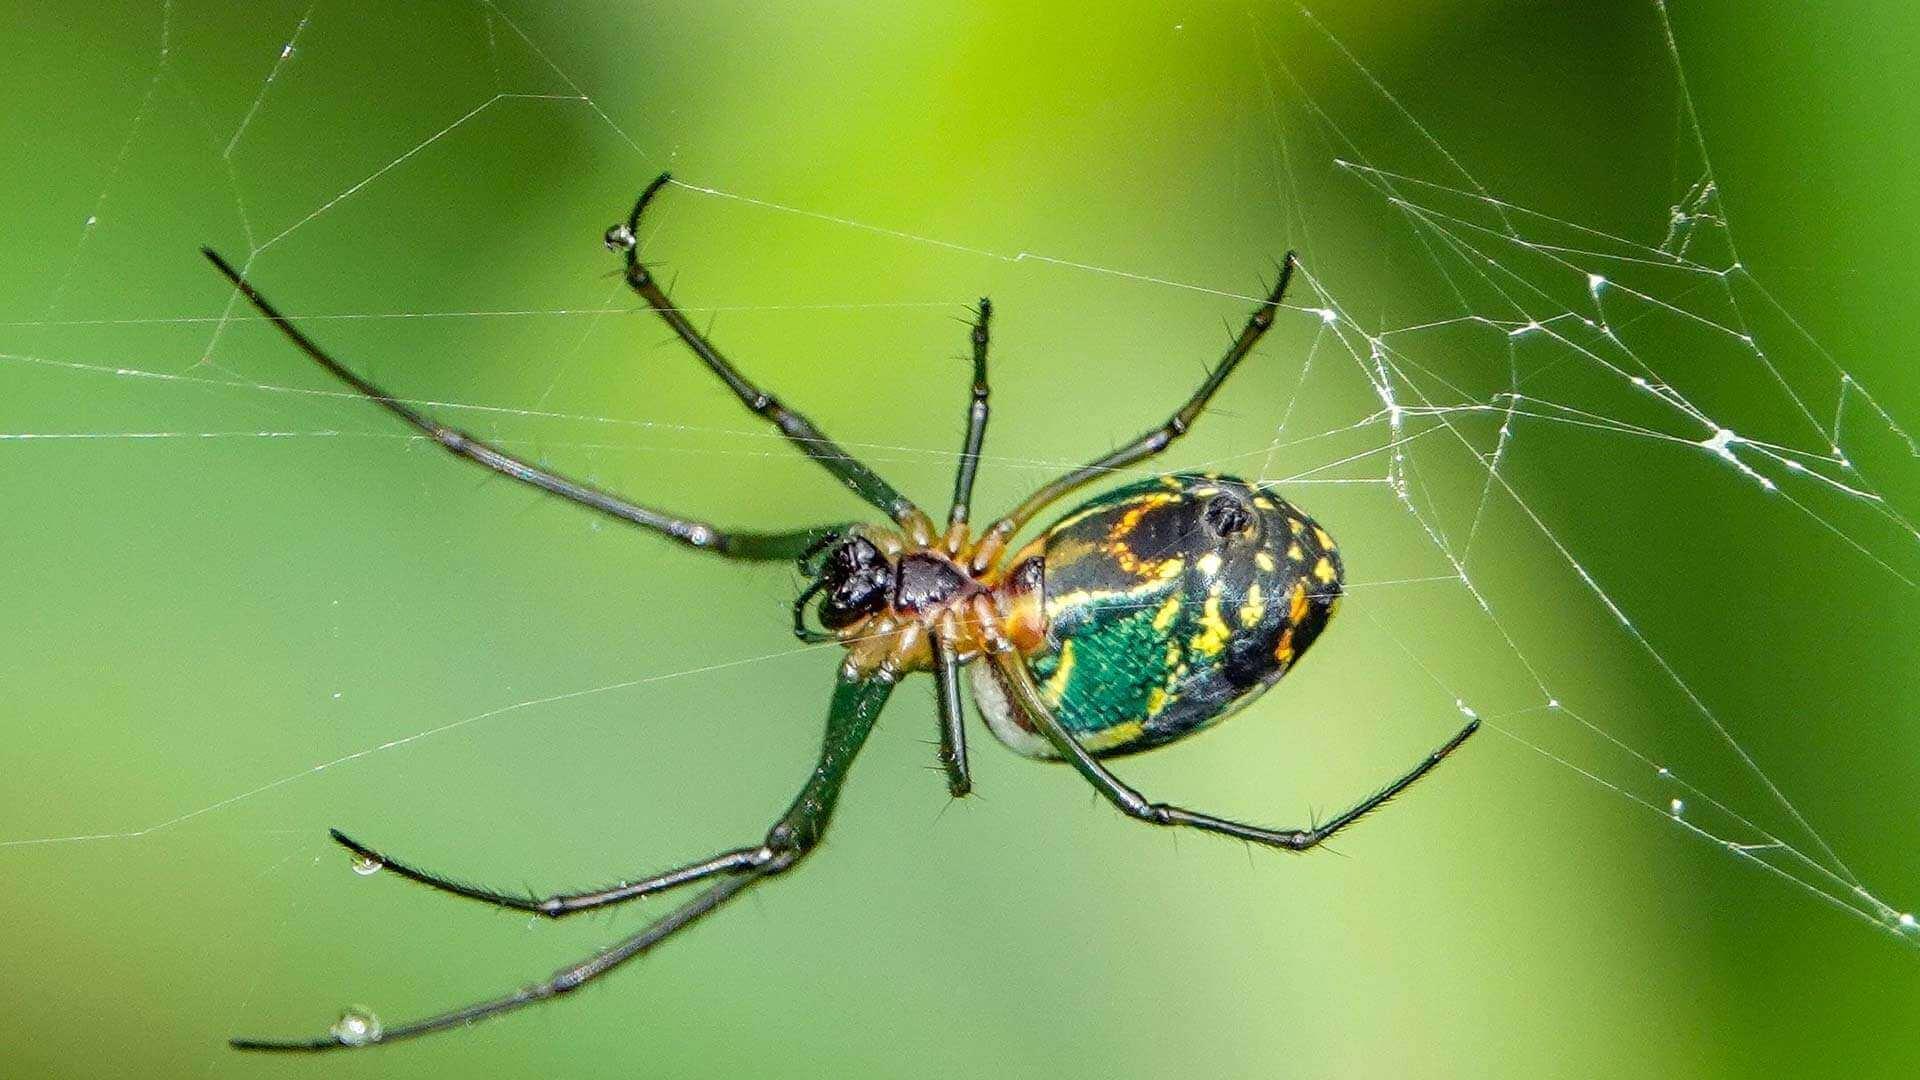 ecuador photography tour - macro image of a colorful spider